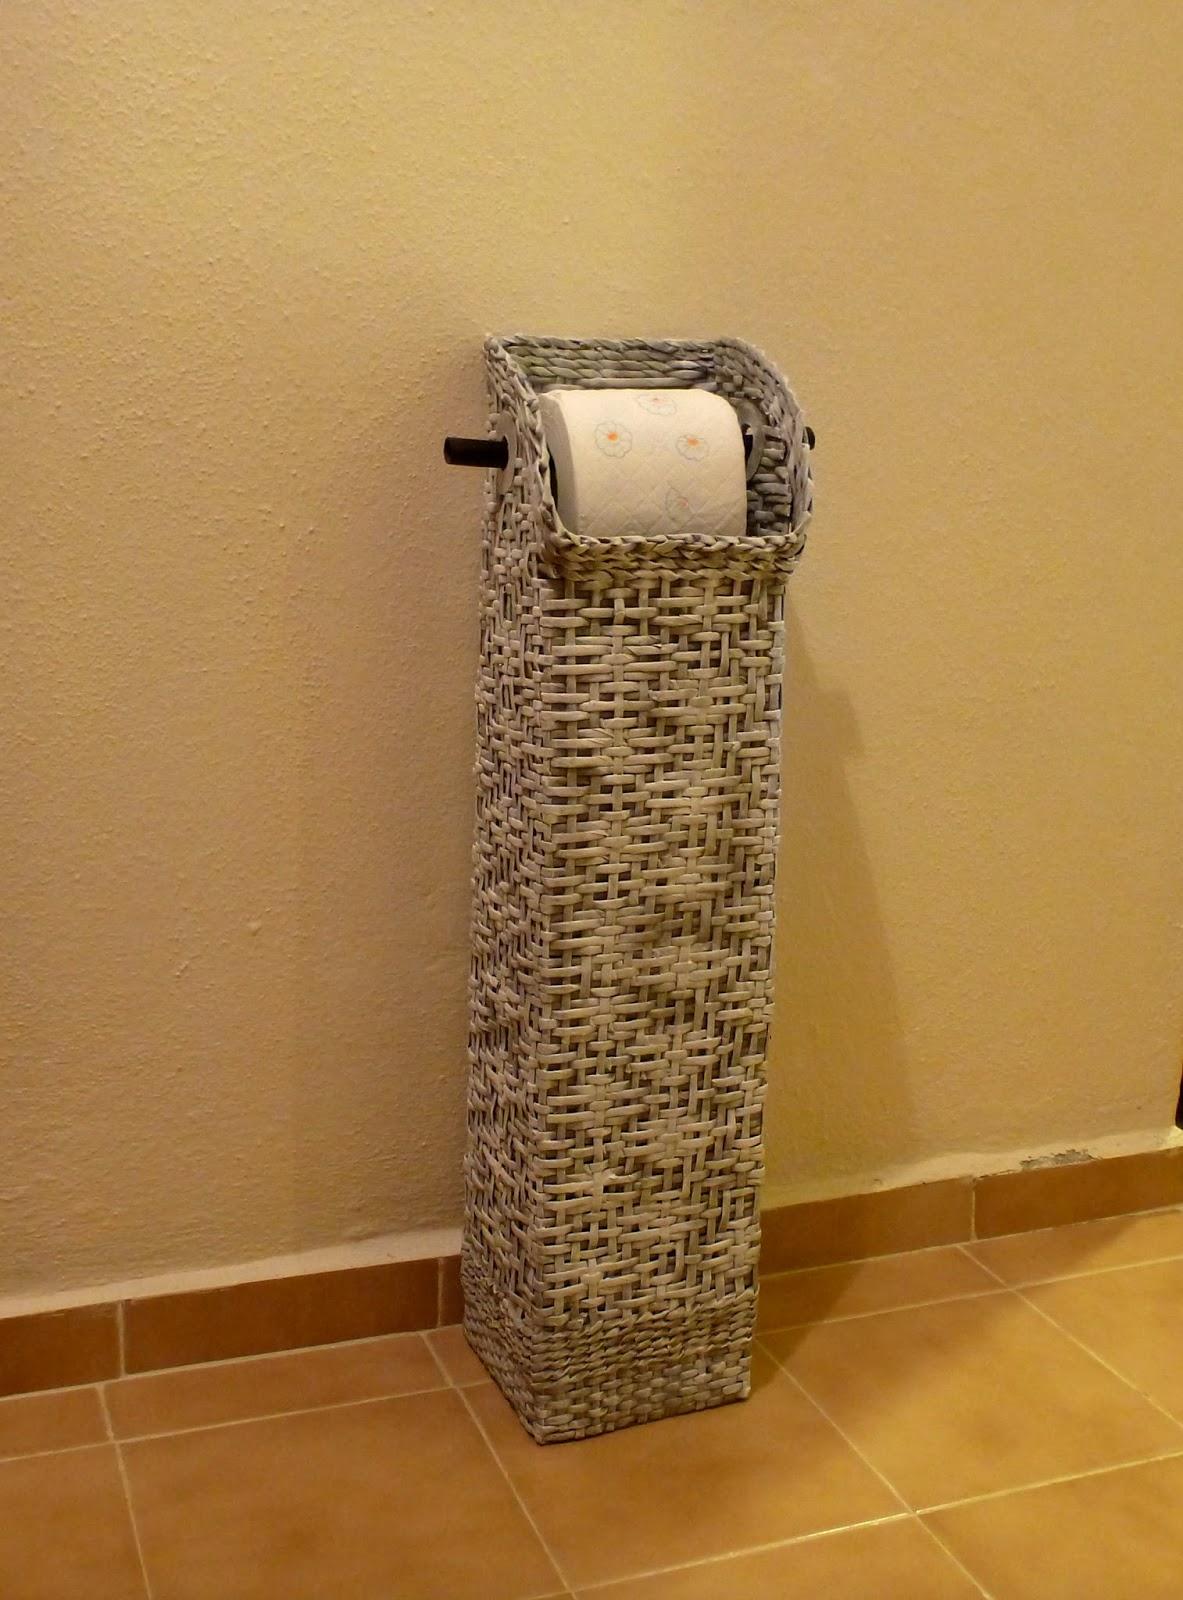 Gerry creations colonna porta rotoli d carta igienica e - Porta carta igienica ...